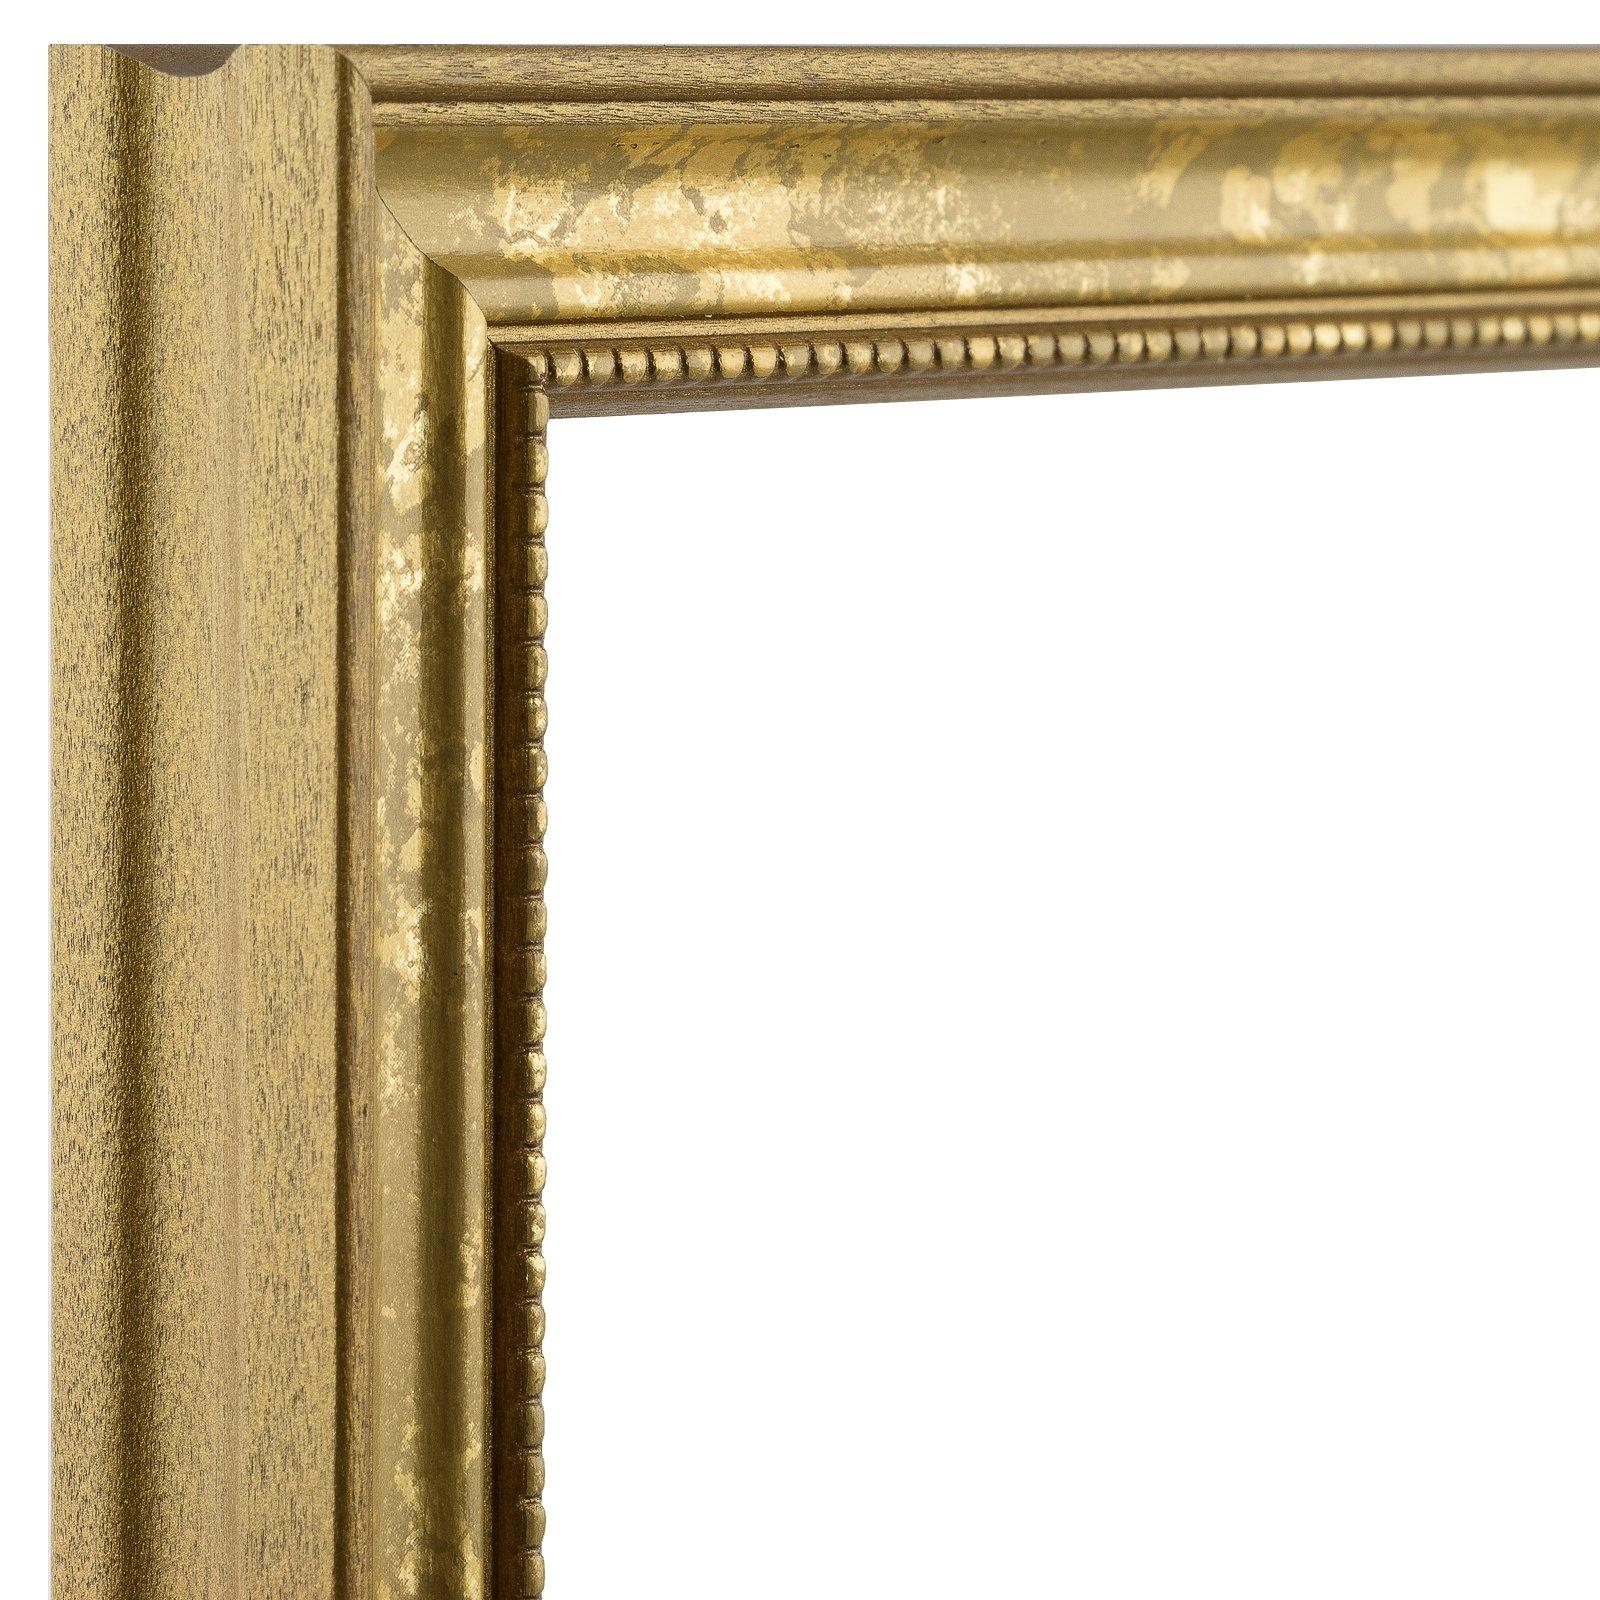 Craig Frames 314GD 24 x 36-Inch Picture Frame, Ornate Finish, 0.75-Inch Wide, Ornate Gold by Craig Frames (Image #3)